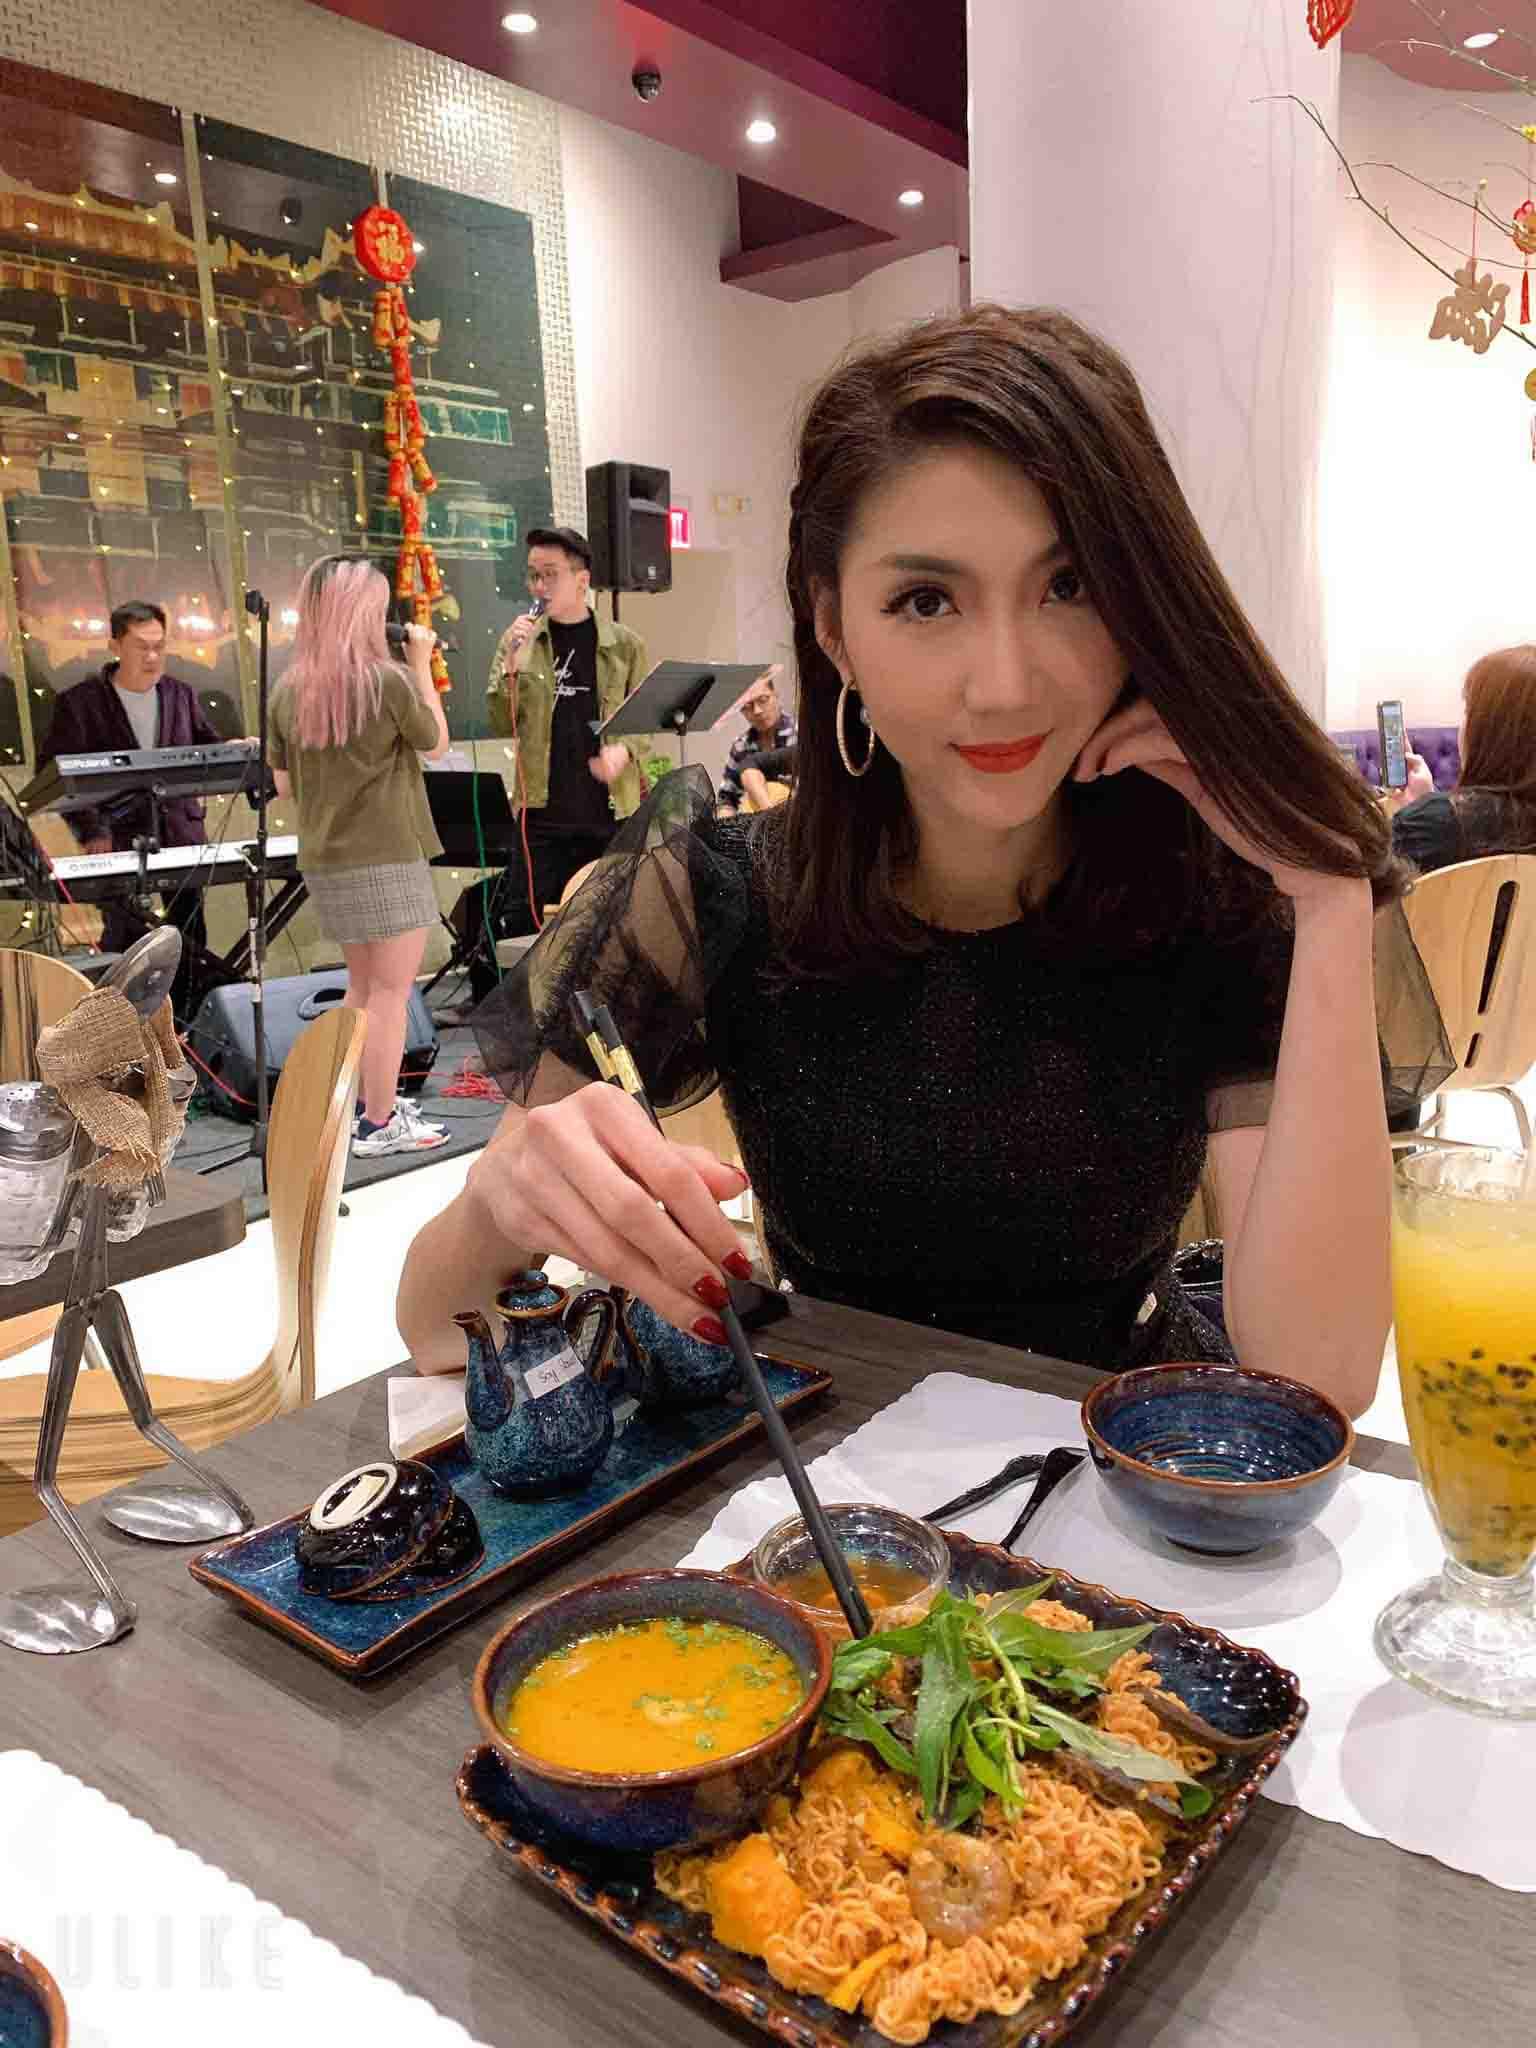 cuoc song sau ly hon cua ngoc quyen: lam ba chu nhung an banh mi 3 bua de nuoi con - 6